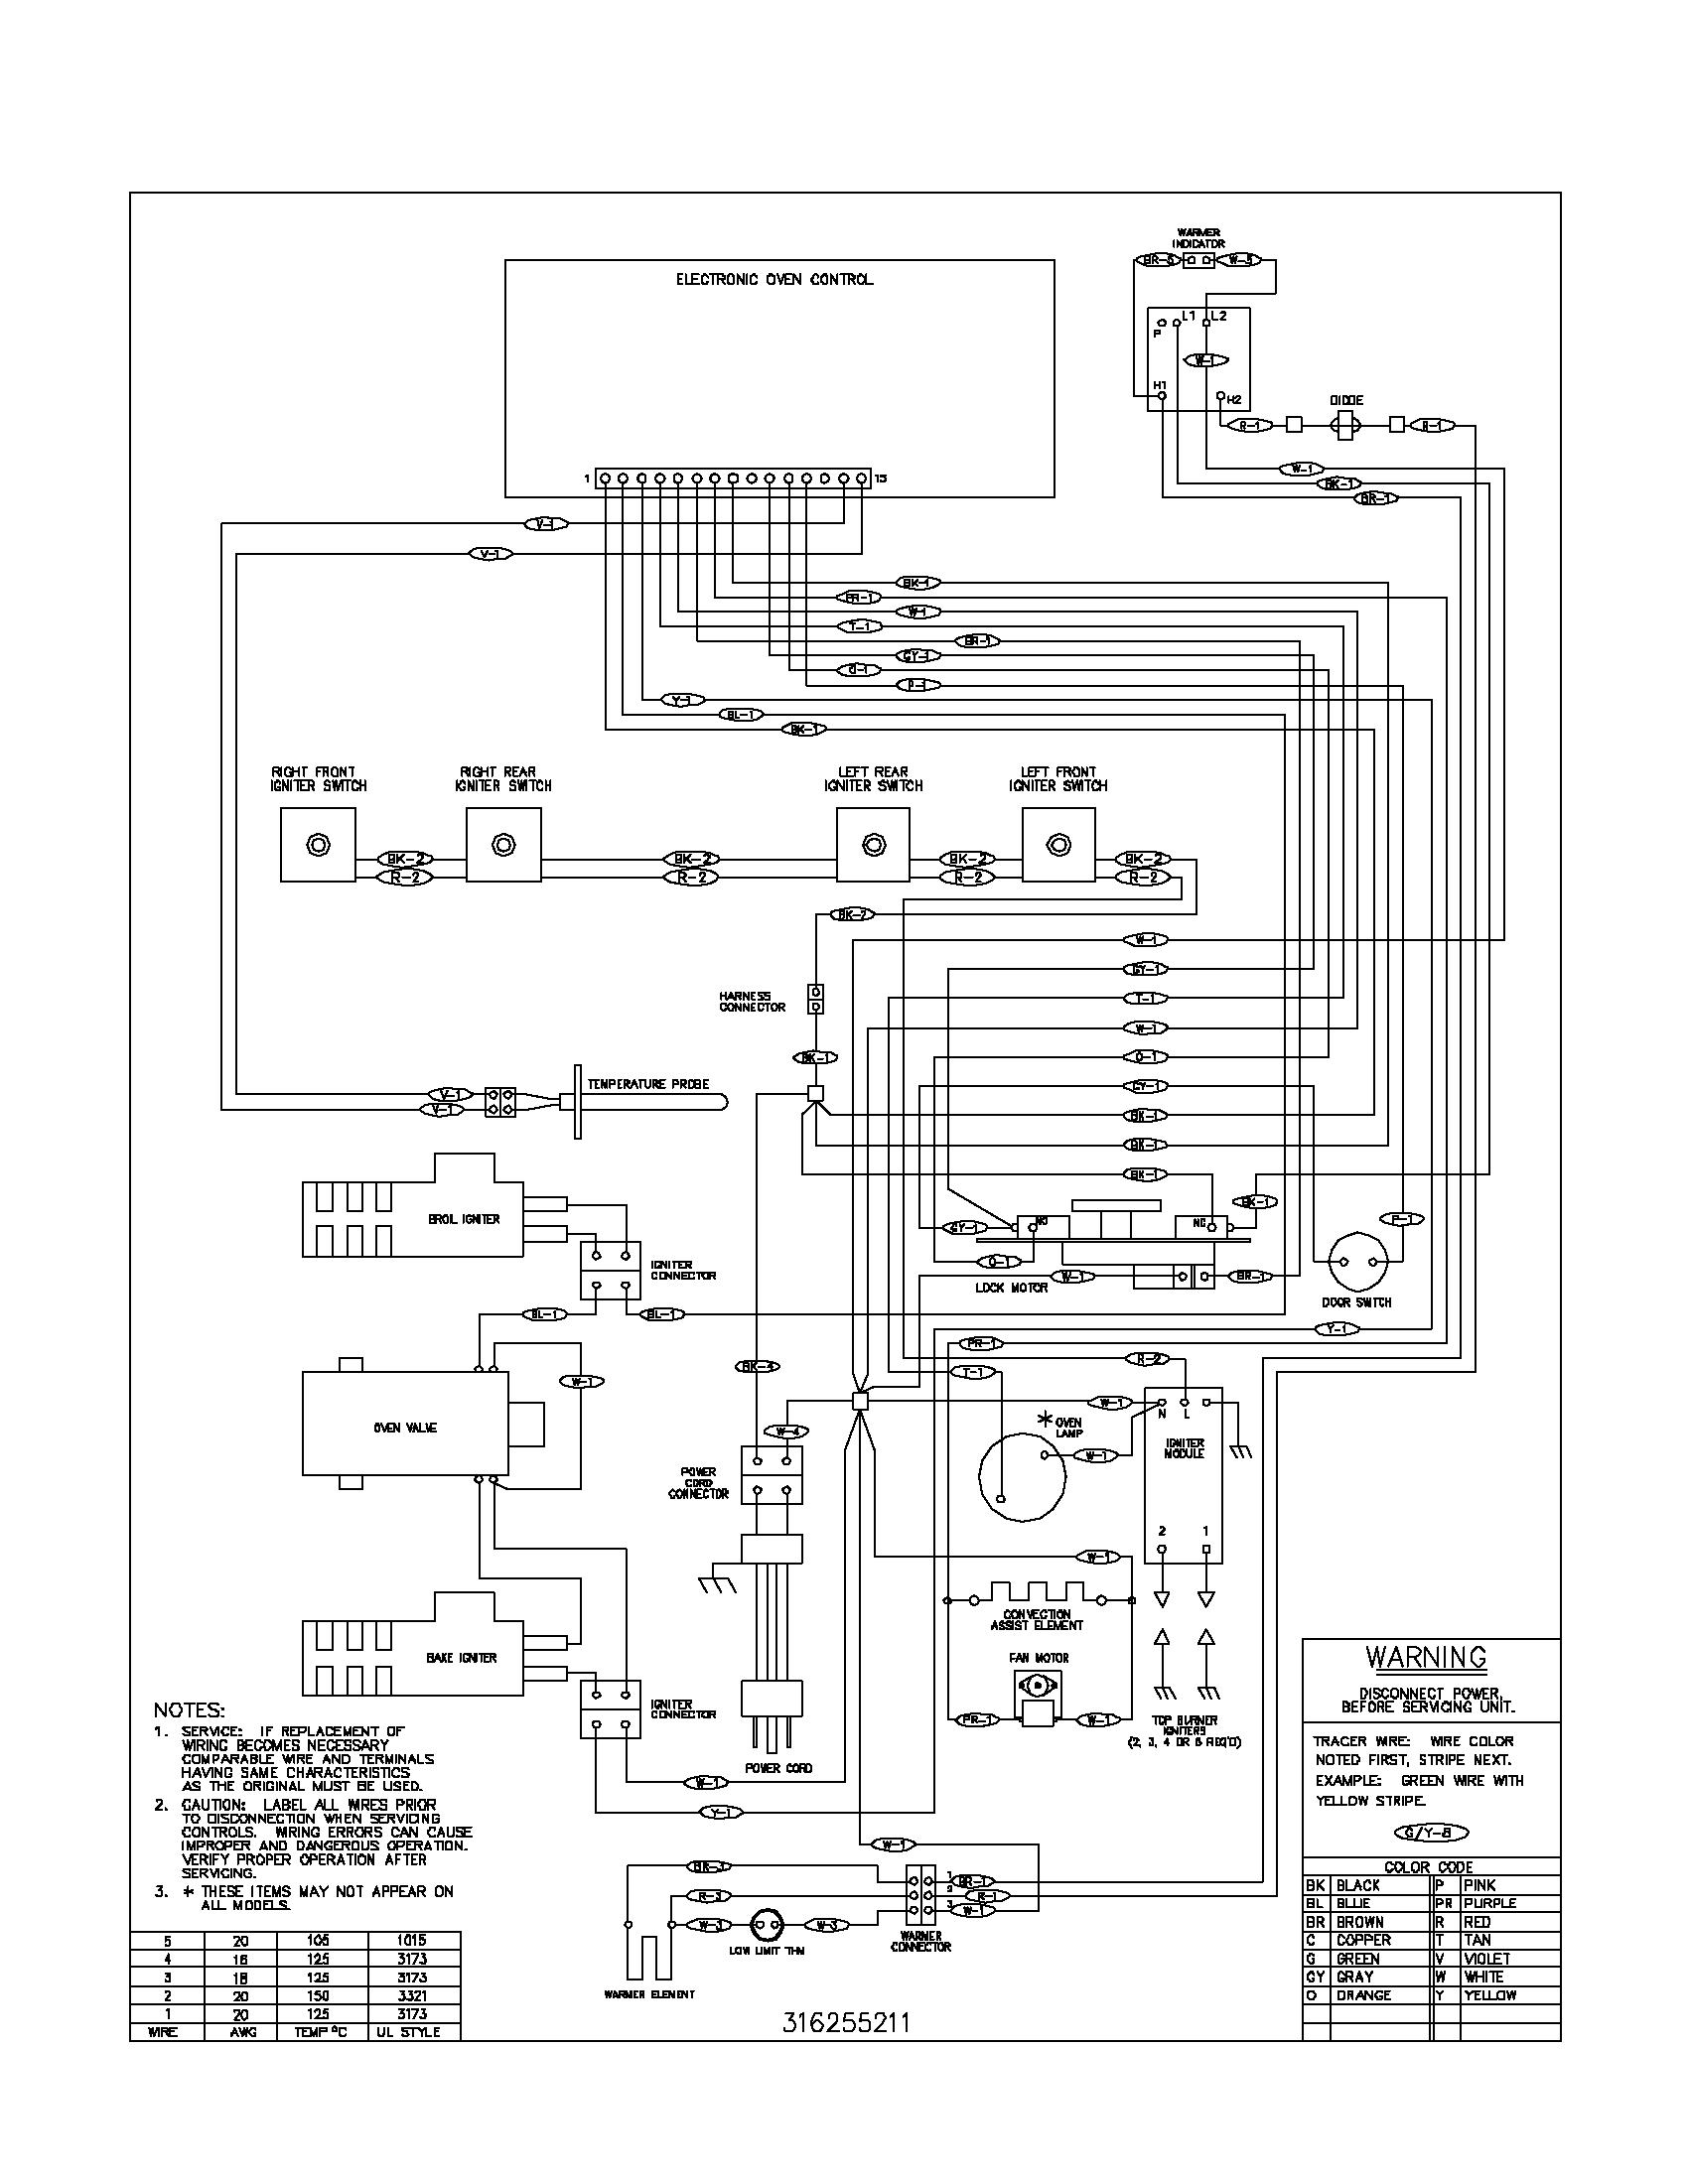 Frigidaire Dryer Wiring Diagram - Eyb.mhcarsalederry.uk •